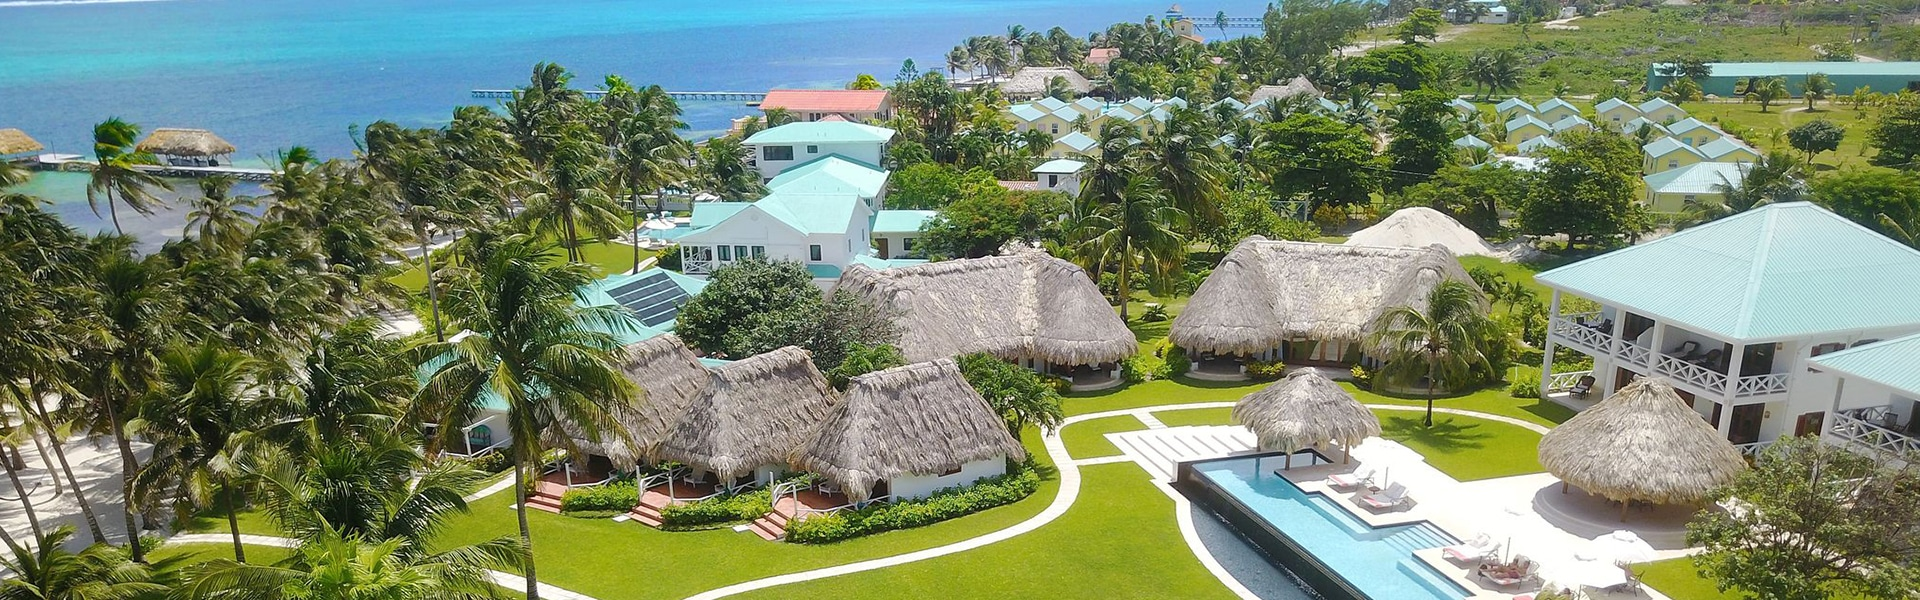 Vctoria house beach resort checkout